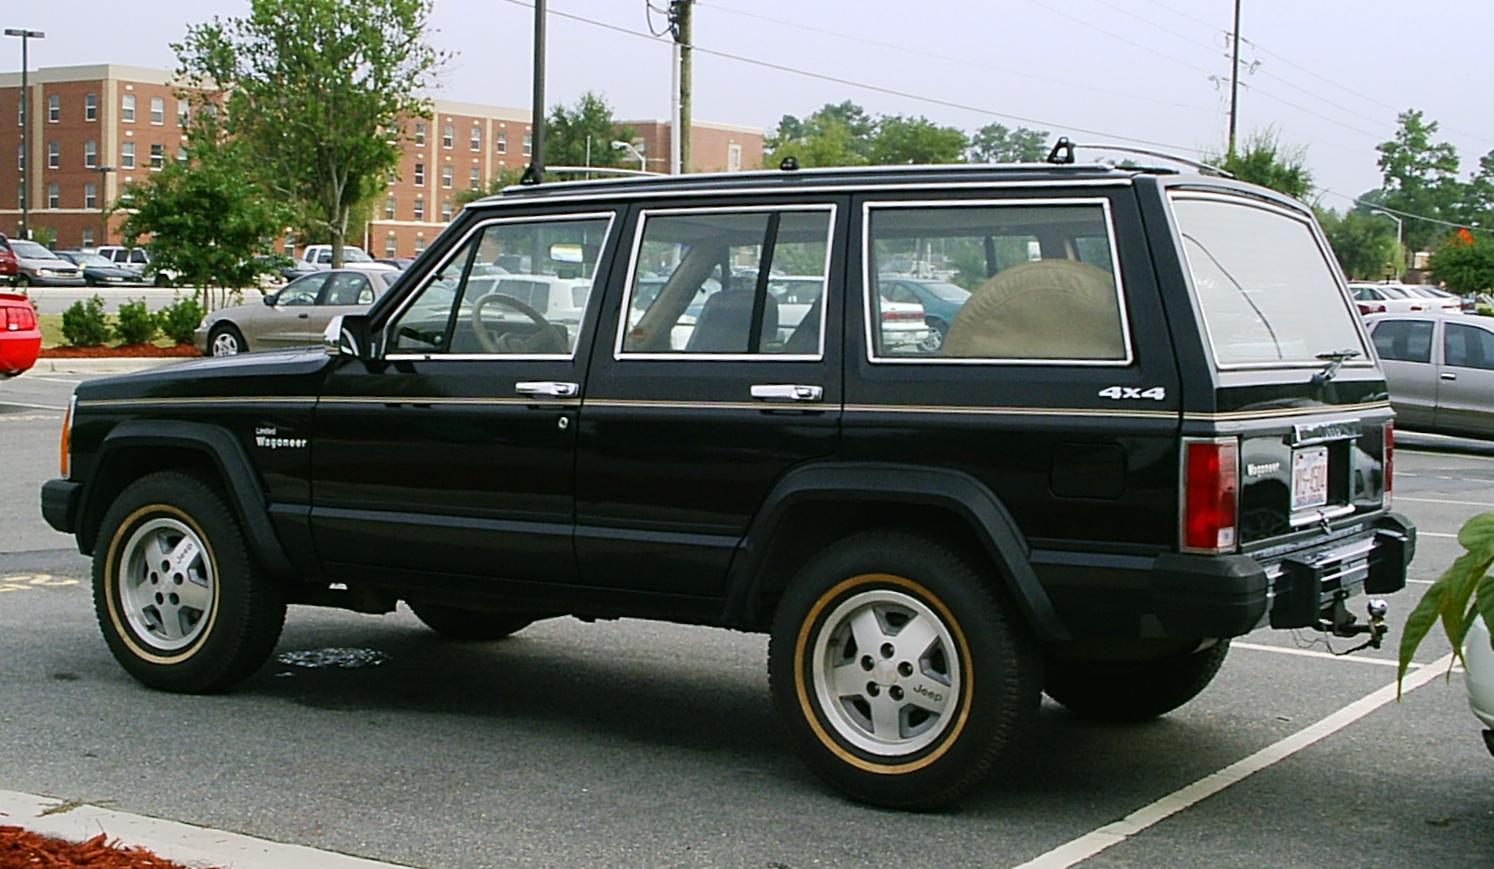 2007 Jeep Grand Cherokee Laredo >> File:Jeep (XJ) Wagoneer Limited black 2.jpg - Wikimedia Commons